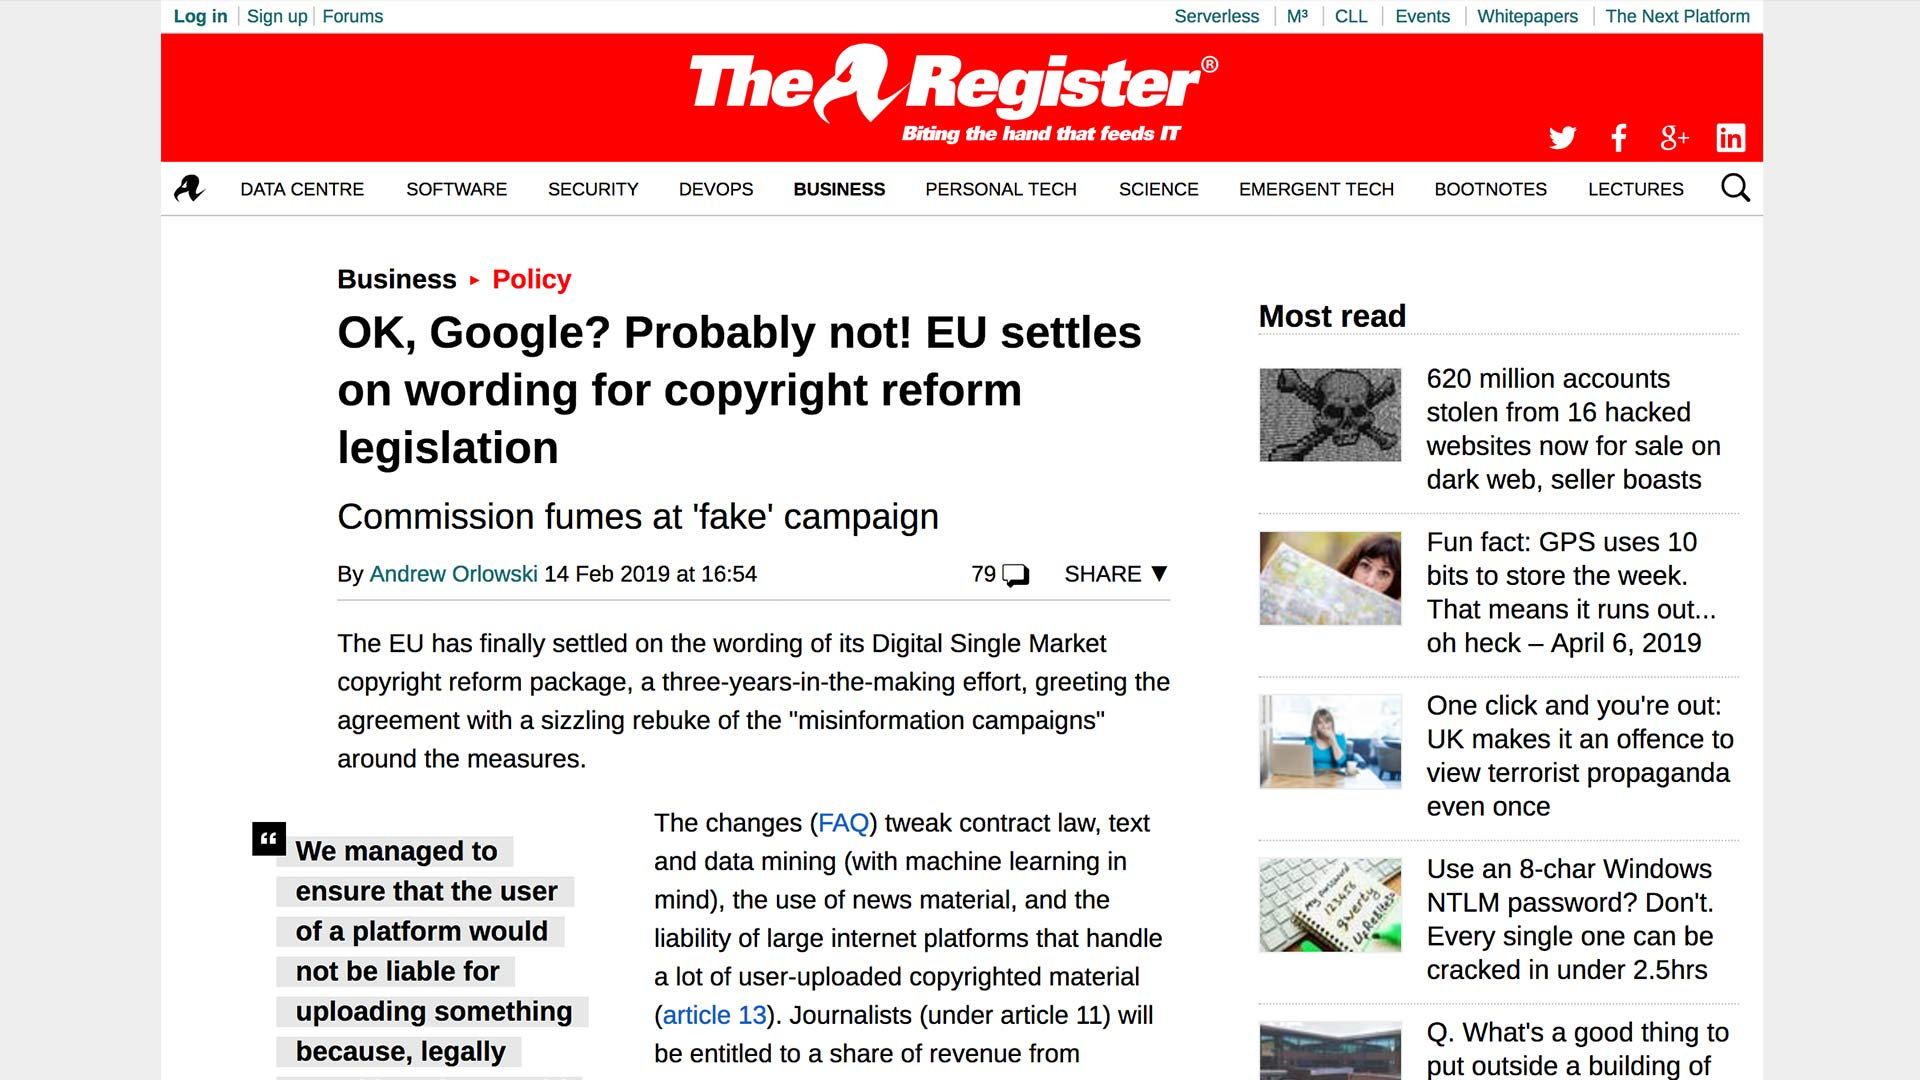 Fairness Rocks News OK, Google? Probably not! EU settles on wording for copyright reform legislation